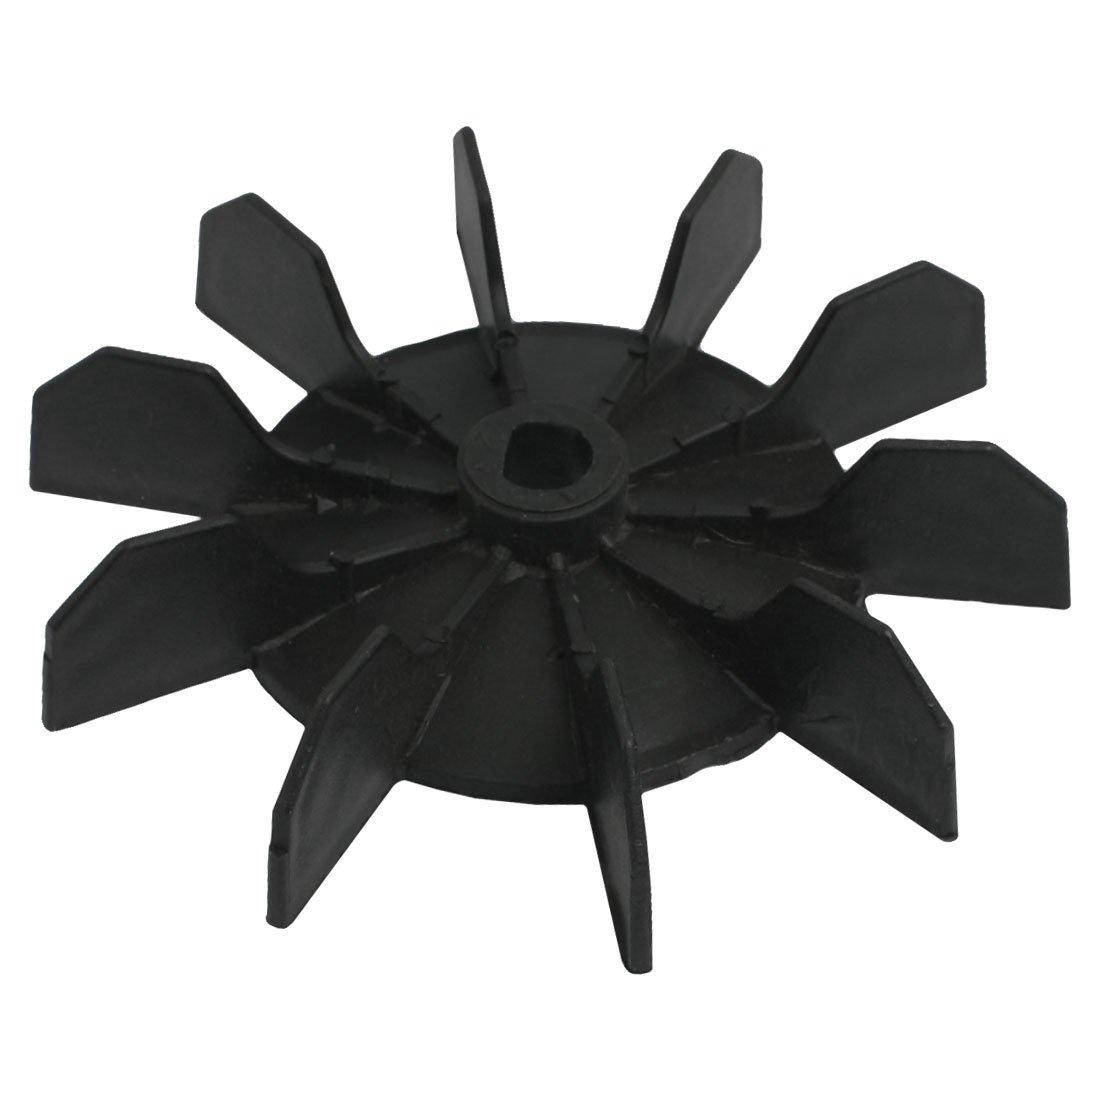 Compressed Air Blades : Inner bore impeller air compressor motor fan blade black ts